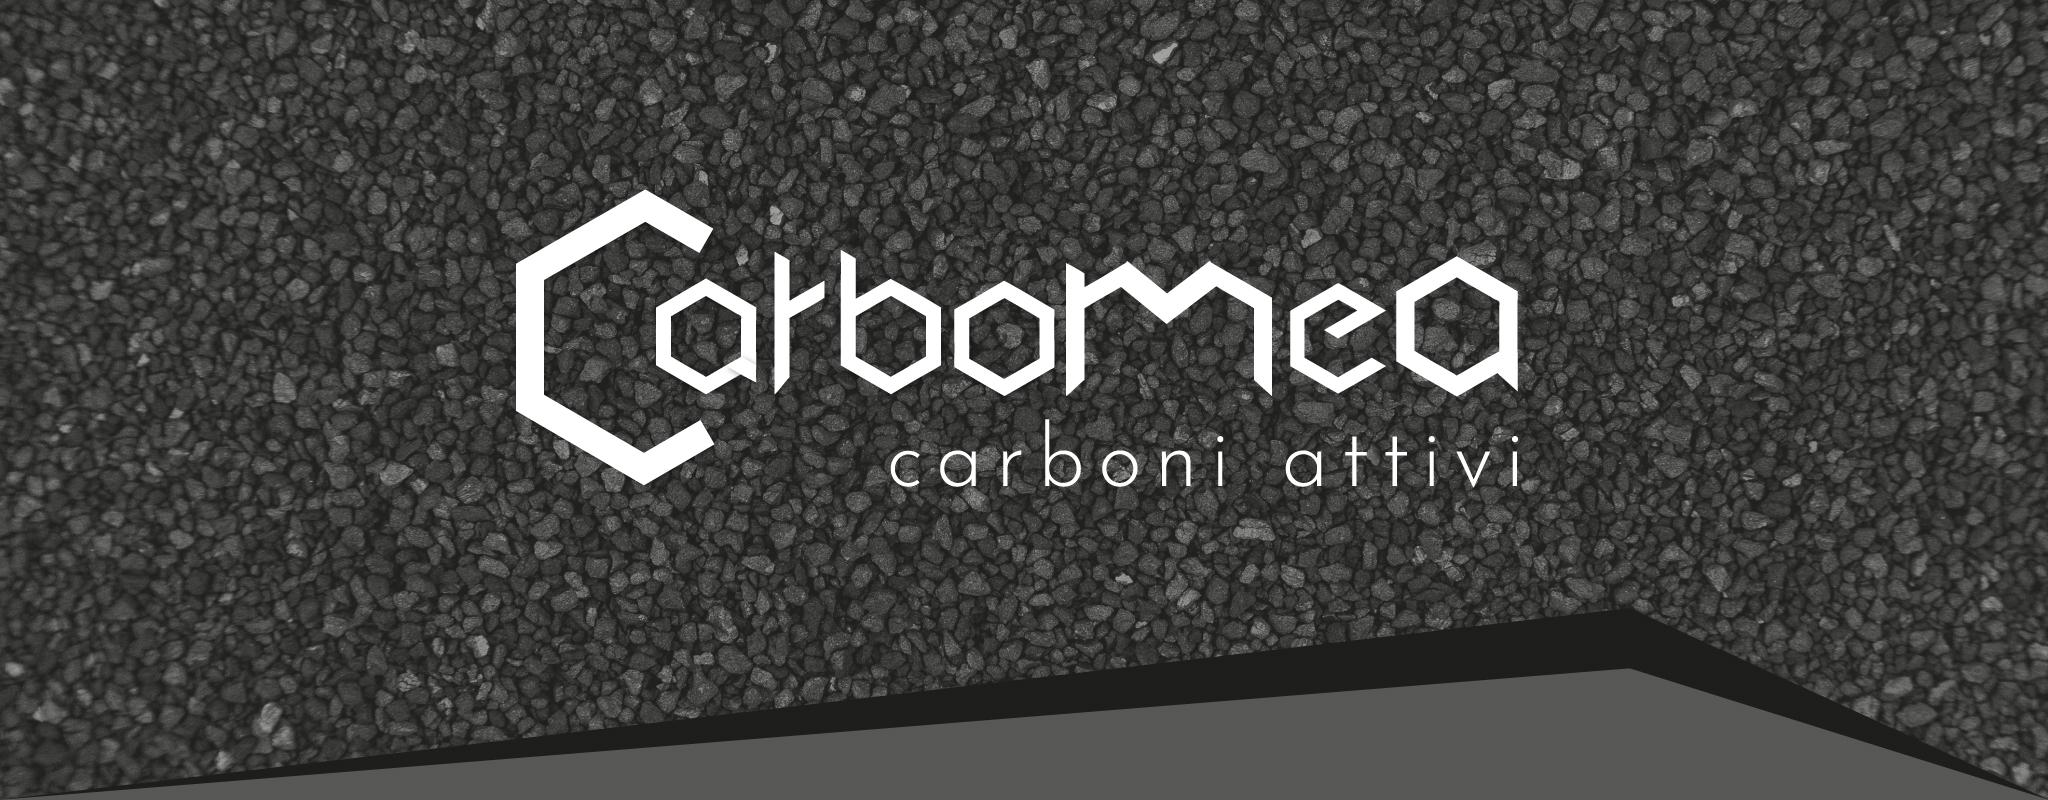 carbomea carboni attivi